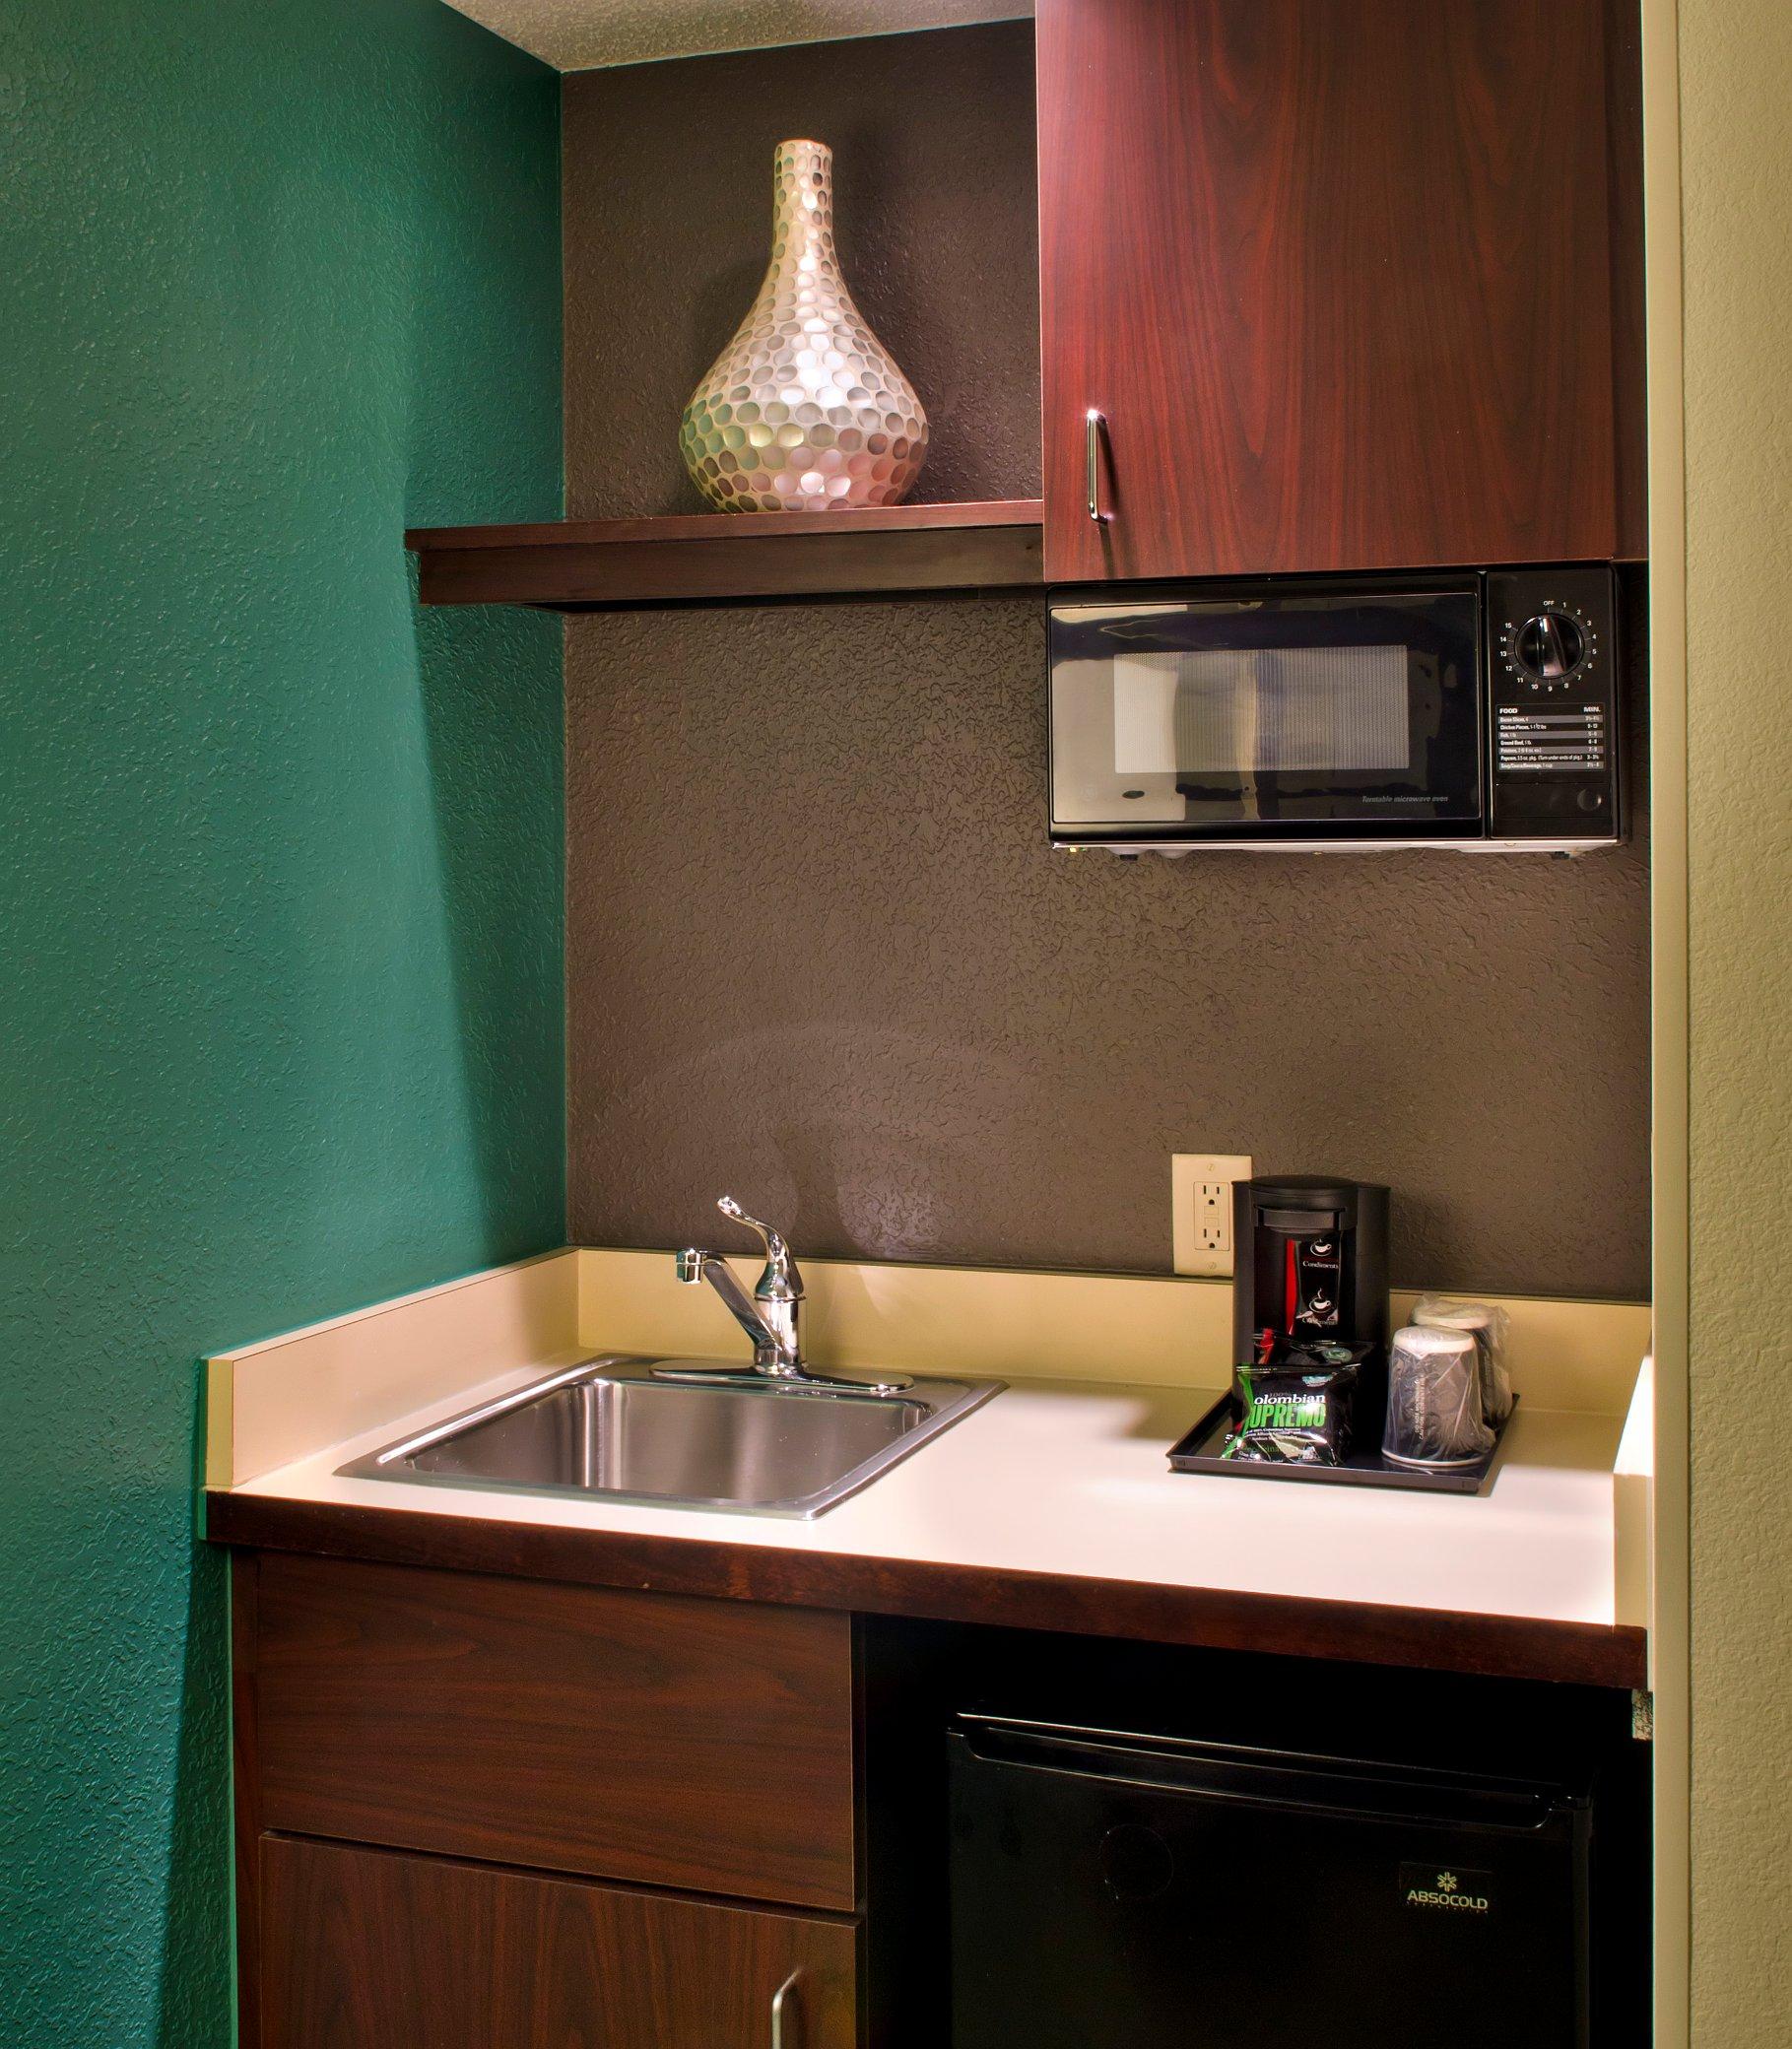 SpringHill Suites by Marriott Danbury image 4